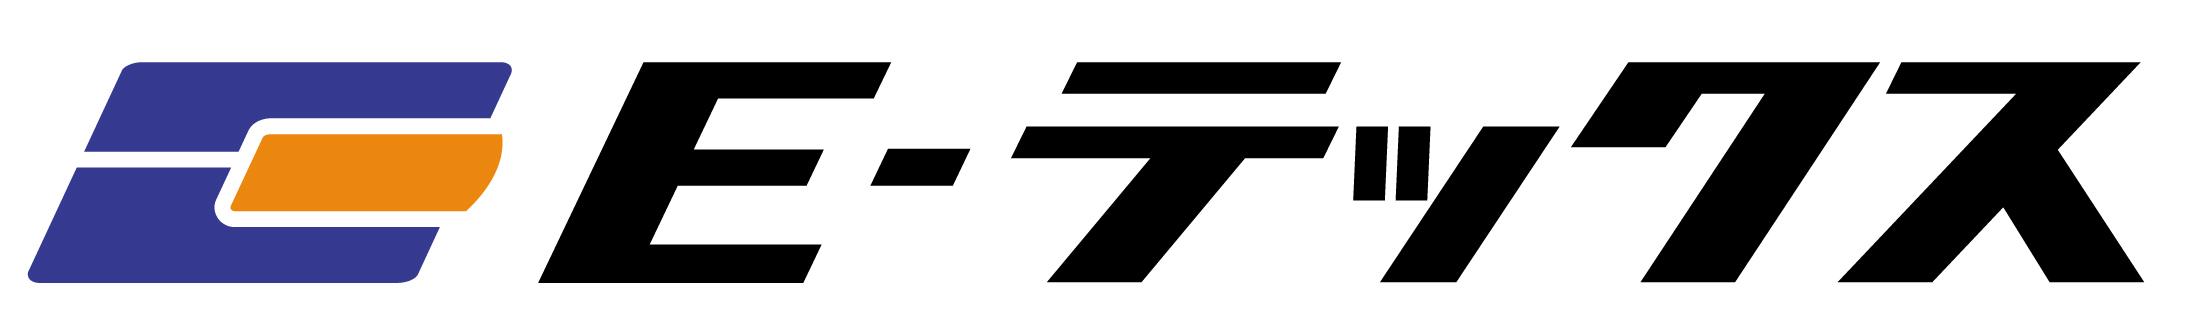 Eテックス|京都府城陽市・宇治市のエコキュート・オール電化・太陽光・蓄電池の工事店